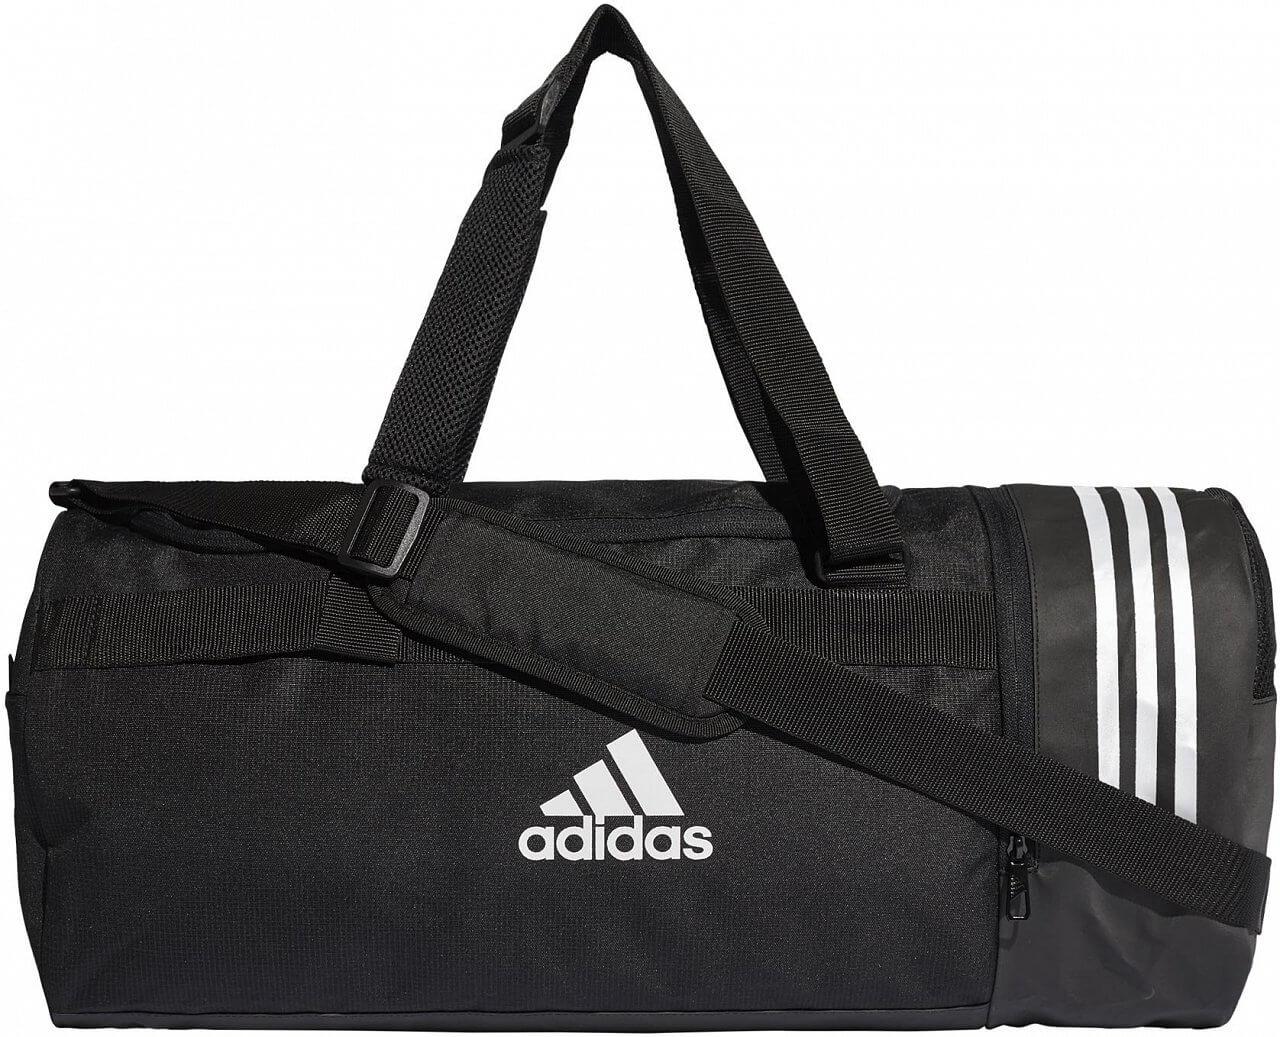 Sportovní taška adidas Convertible 3 Stripes Duffel Bag M